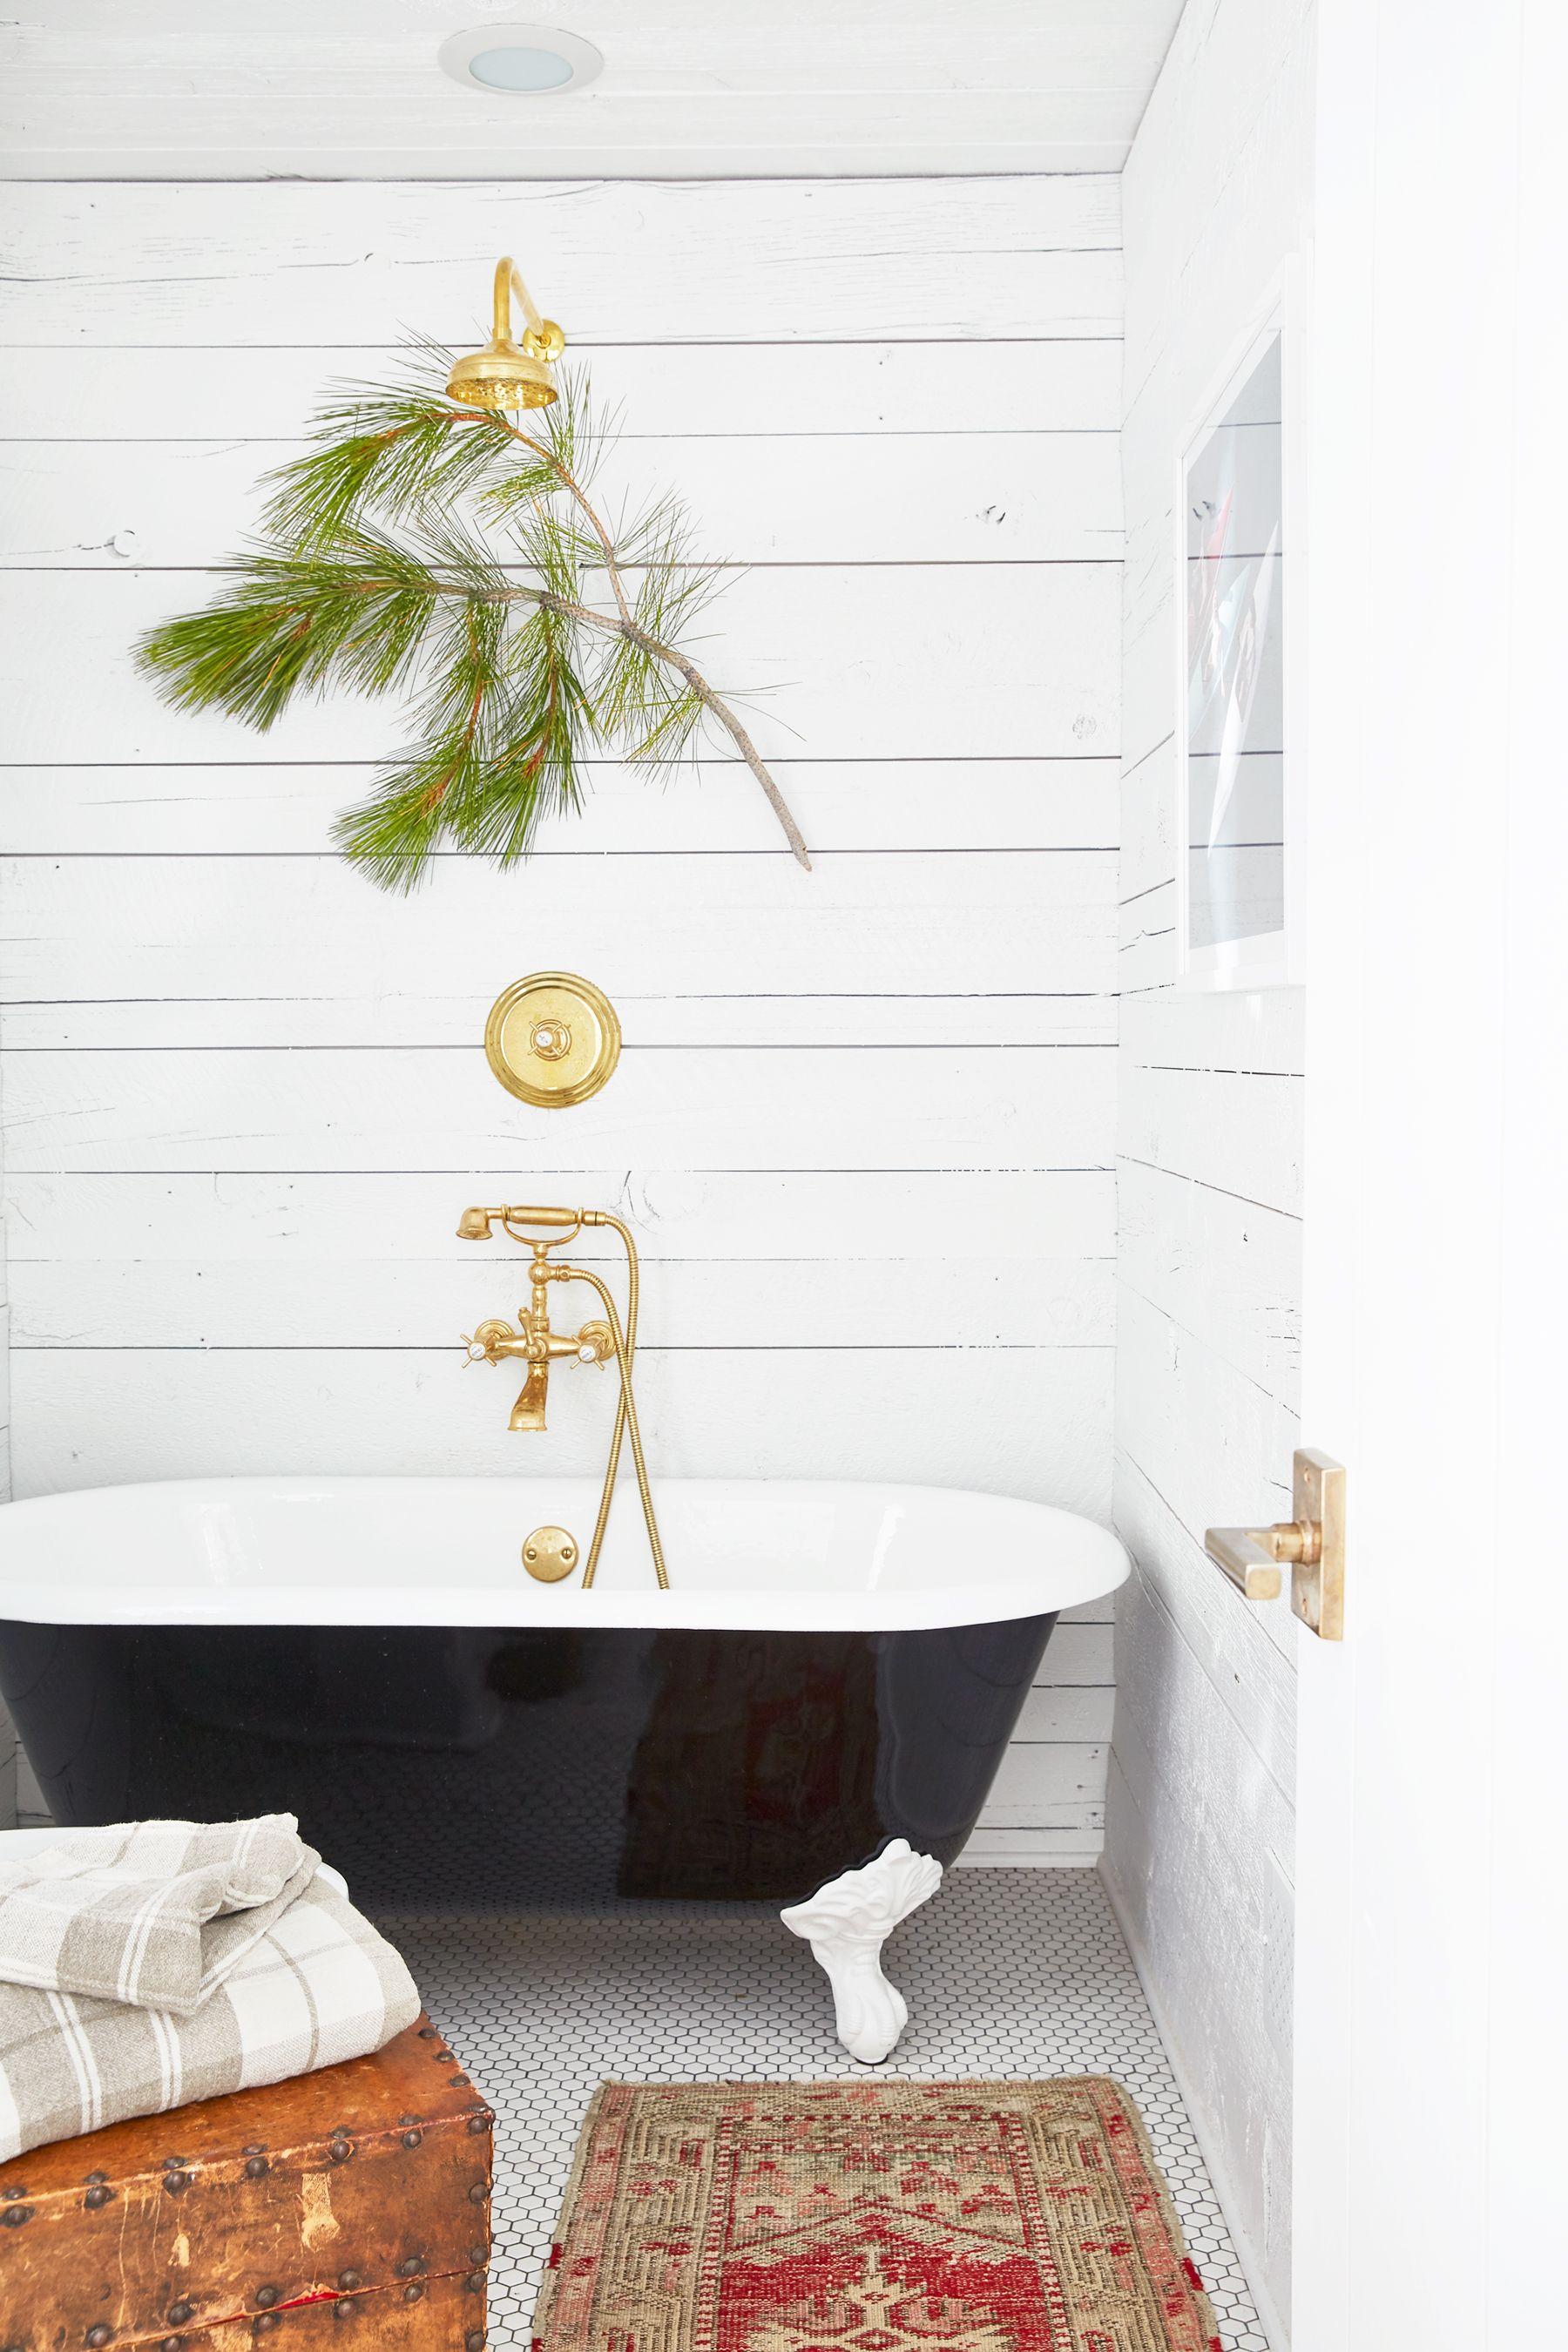 20 Best Farmhouse Bathroom Design Ideas, Modern Farmhouse Bathroom Wall Decor Ideas